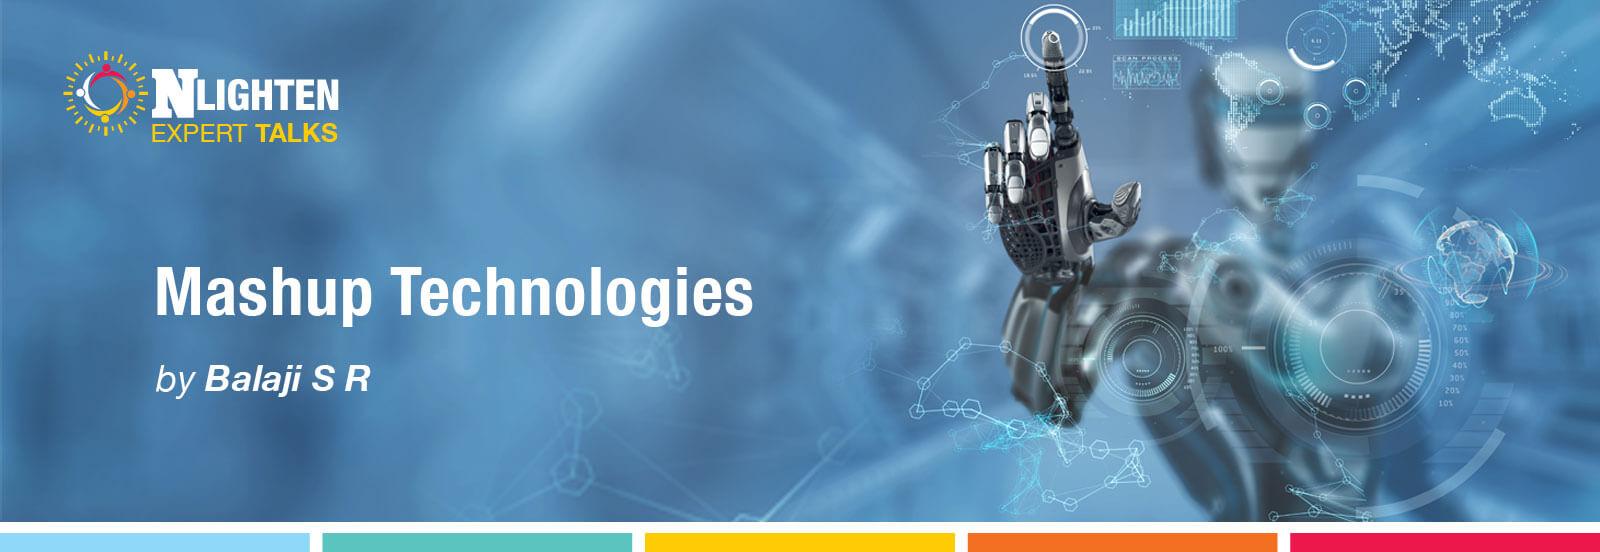 Mashup technologies banner